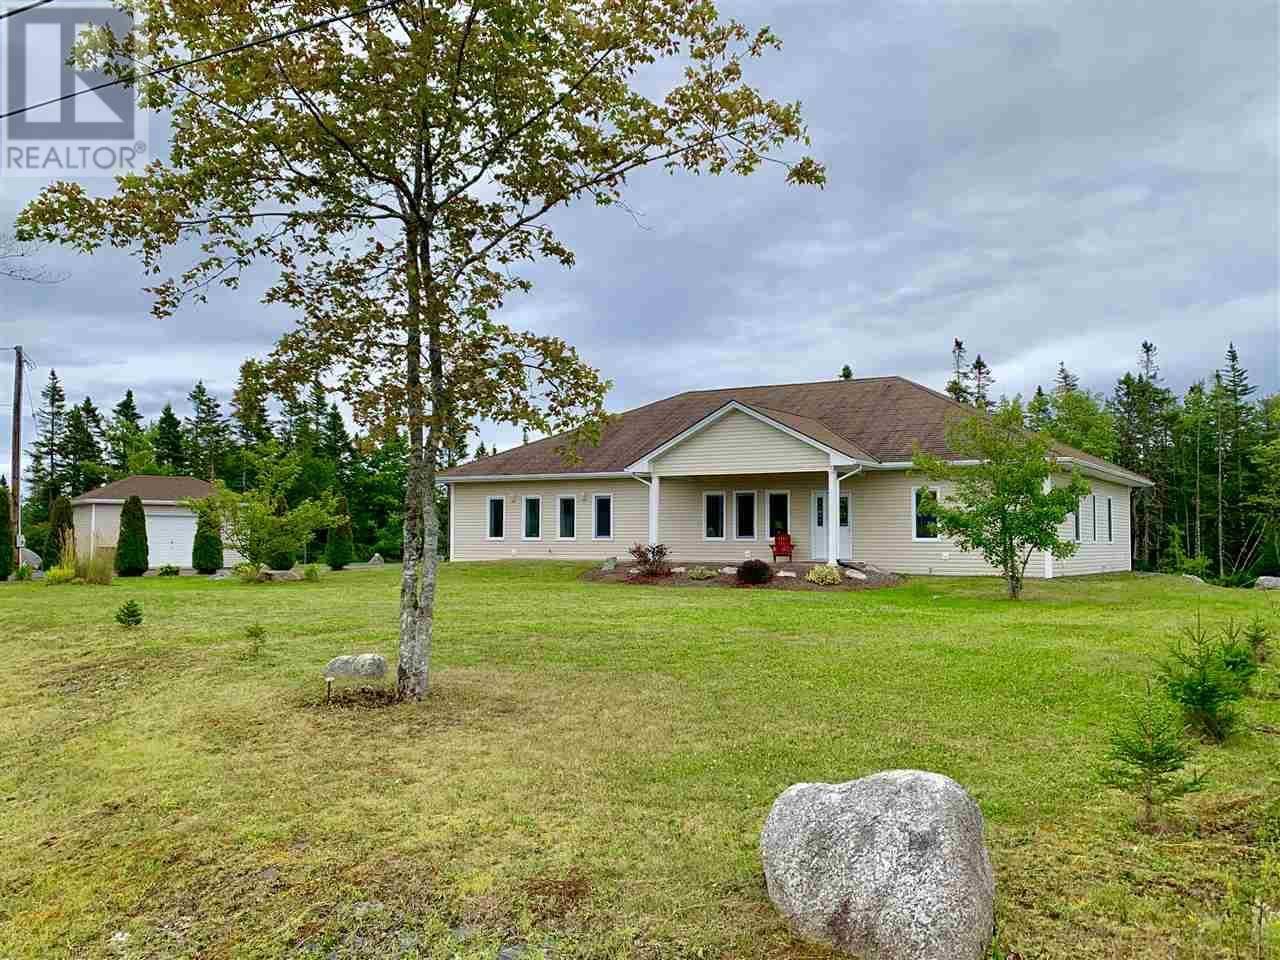 House for sale at 2 Westridge Rd Hatchet Lake Nova Scotia - MLS: 201920885